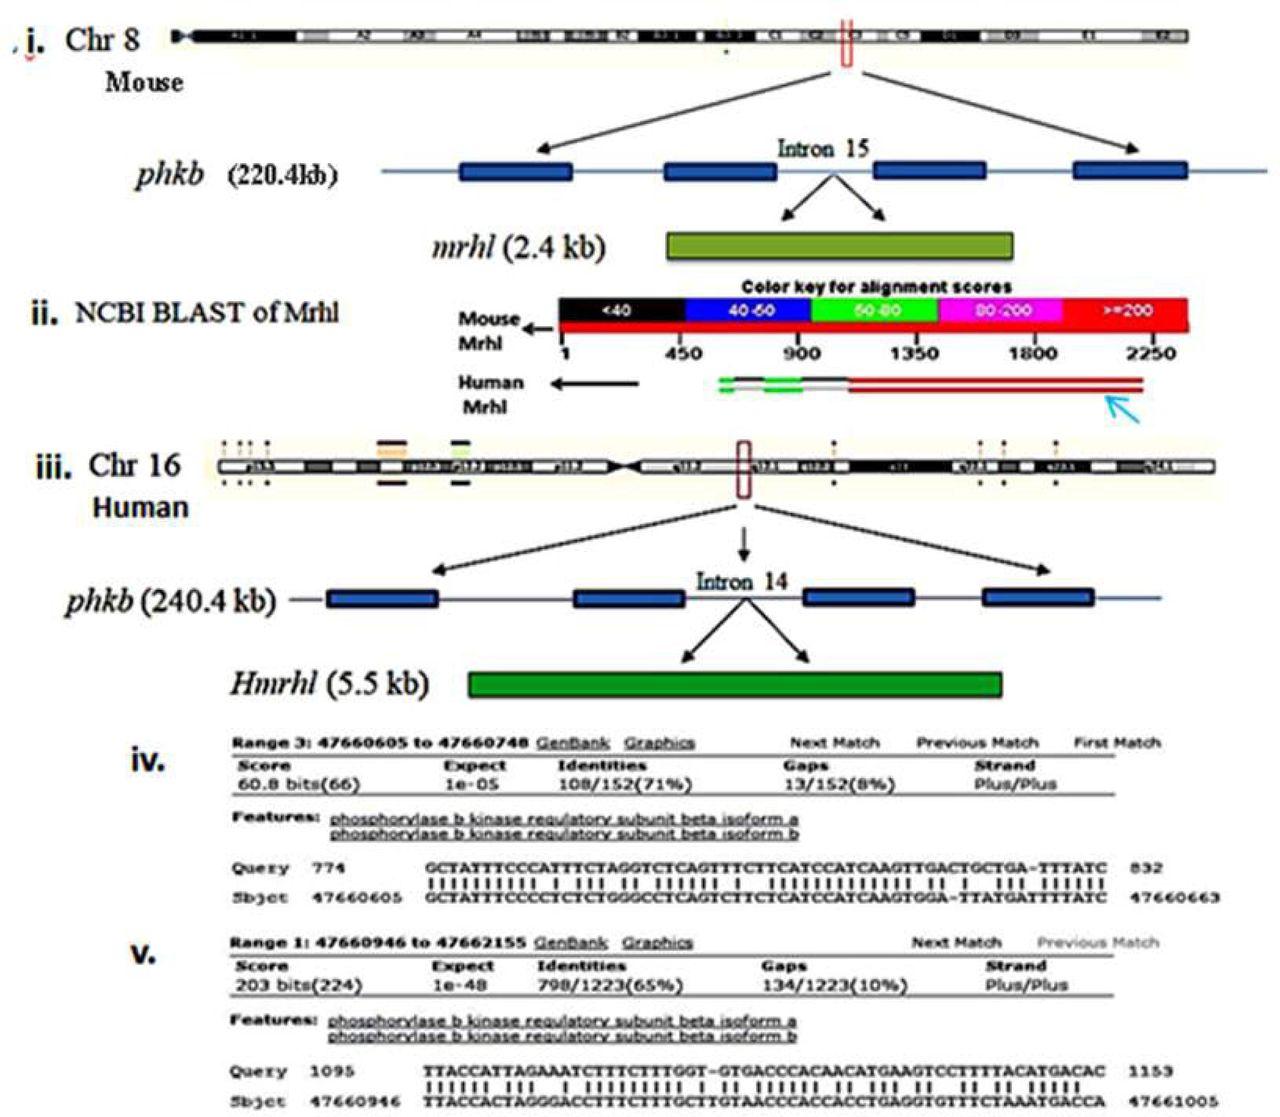 A novel enhancer RNA, Hmrhl, positively regulates its host gene